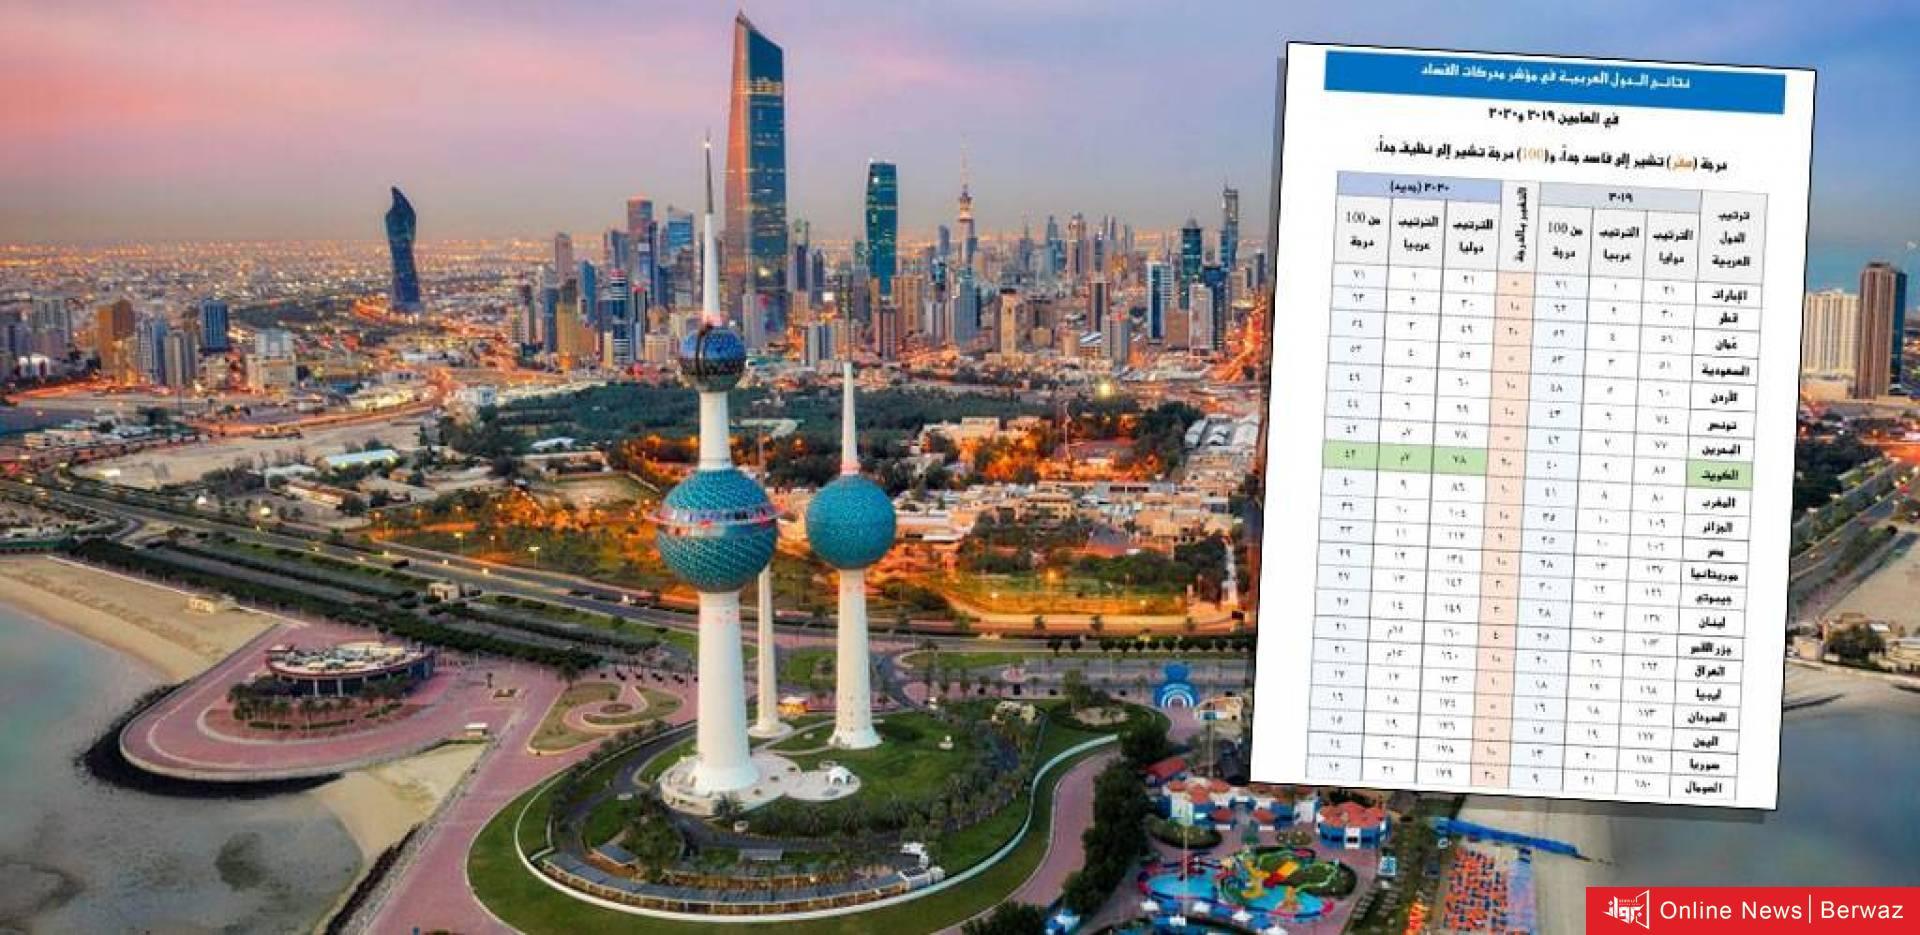 123 949336 highres - الكويت تقفز 7 مراكز في مؤشر الشفافية الدولية